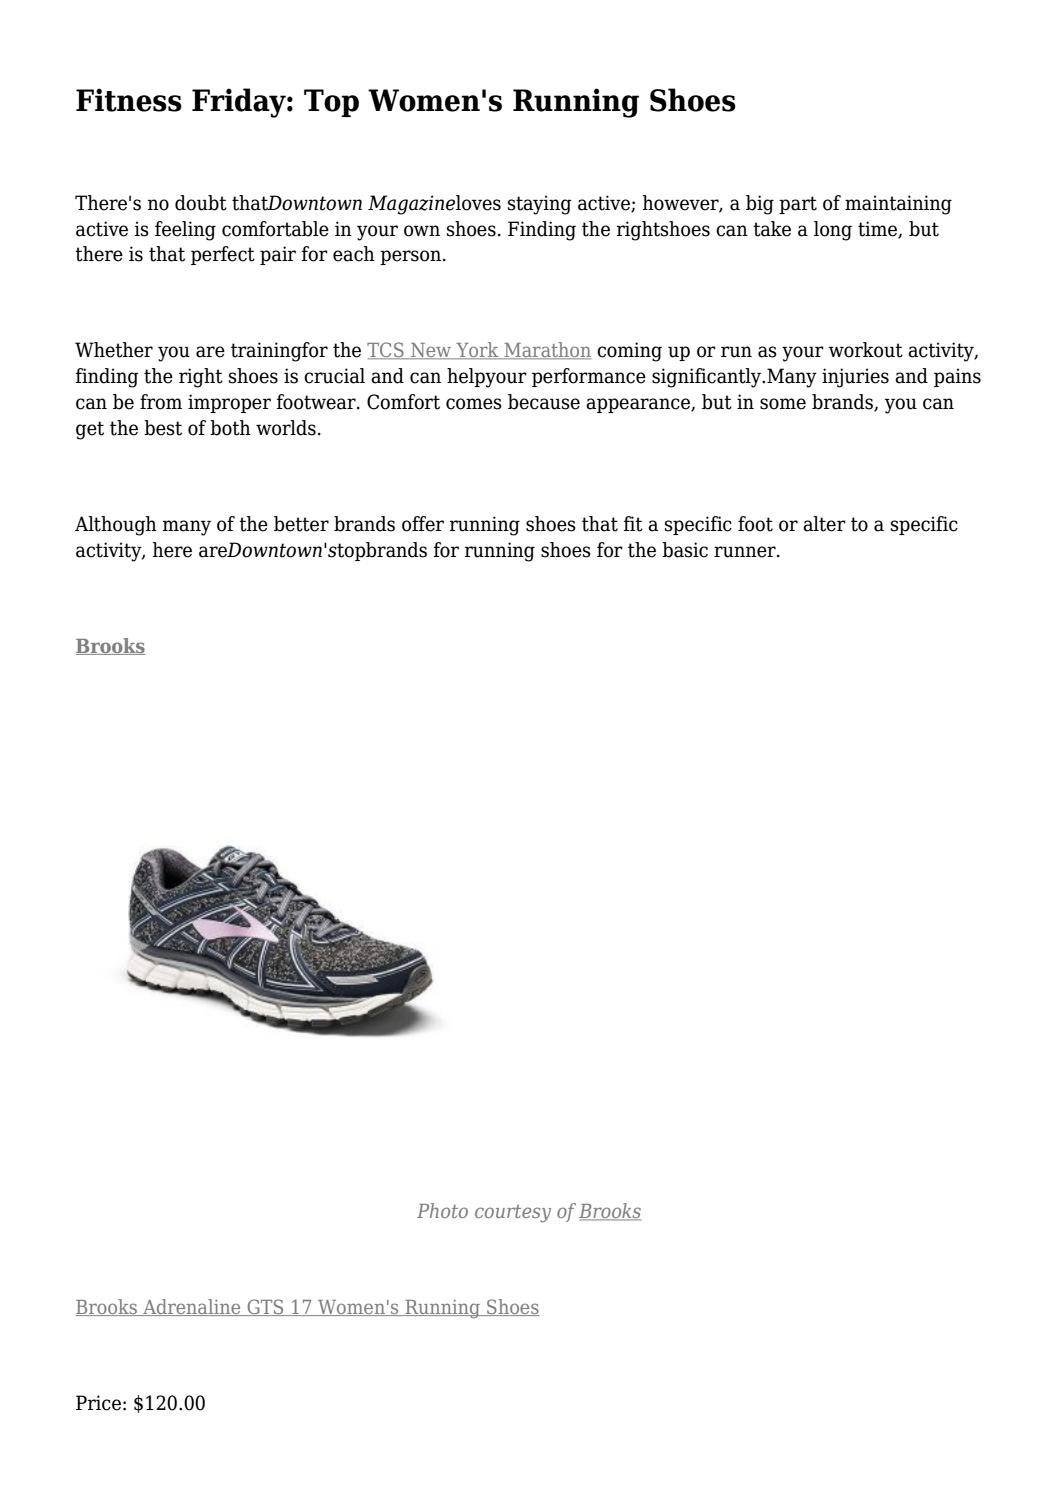 Fitness Friday: Top Women's Running